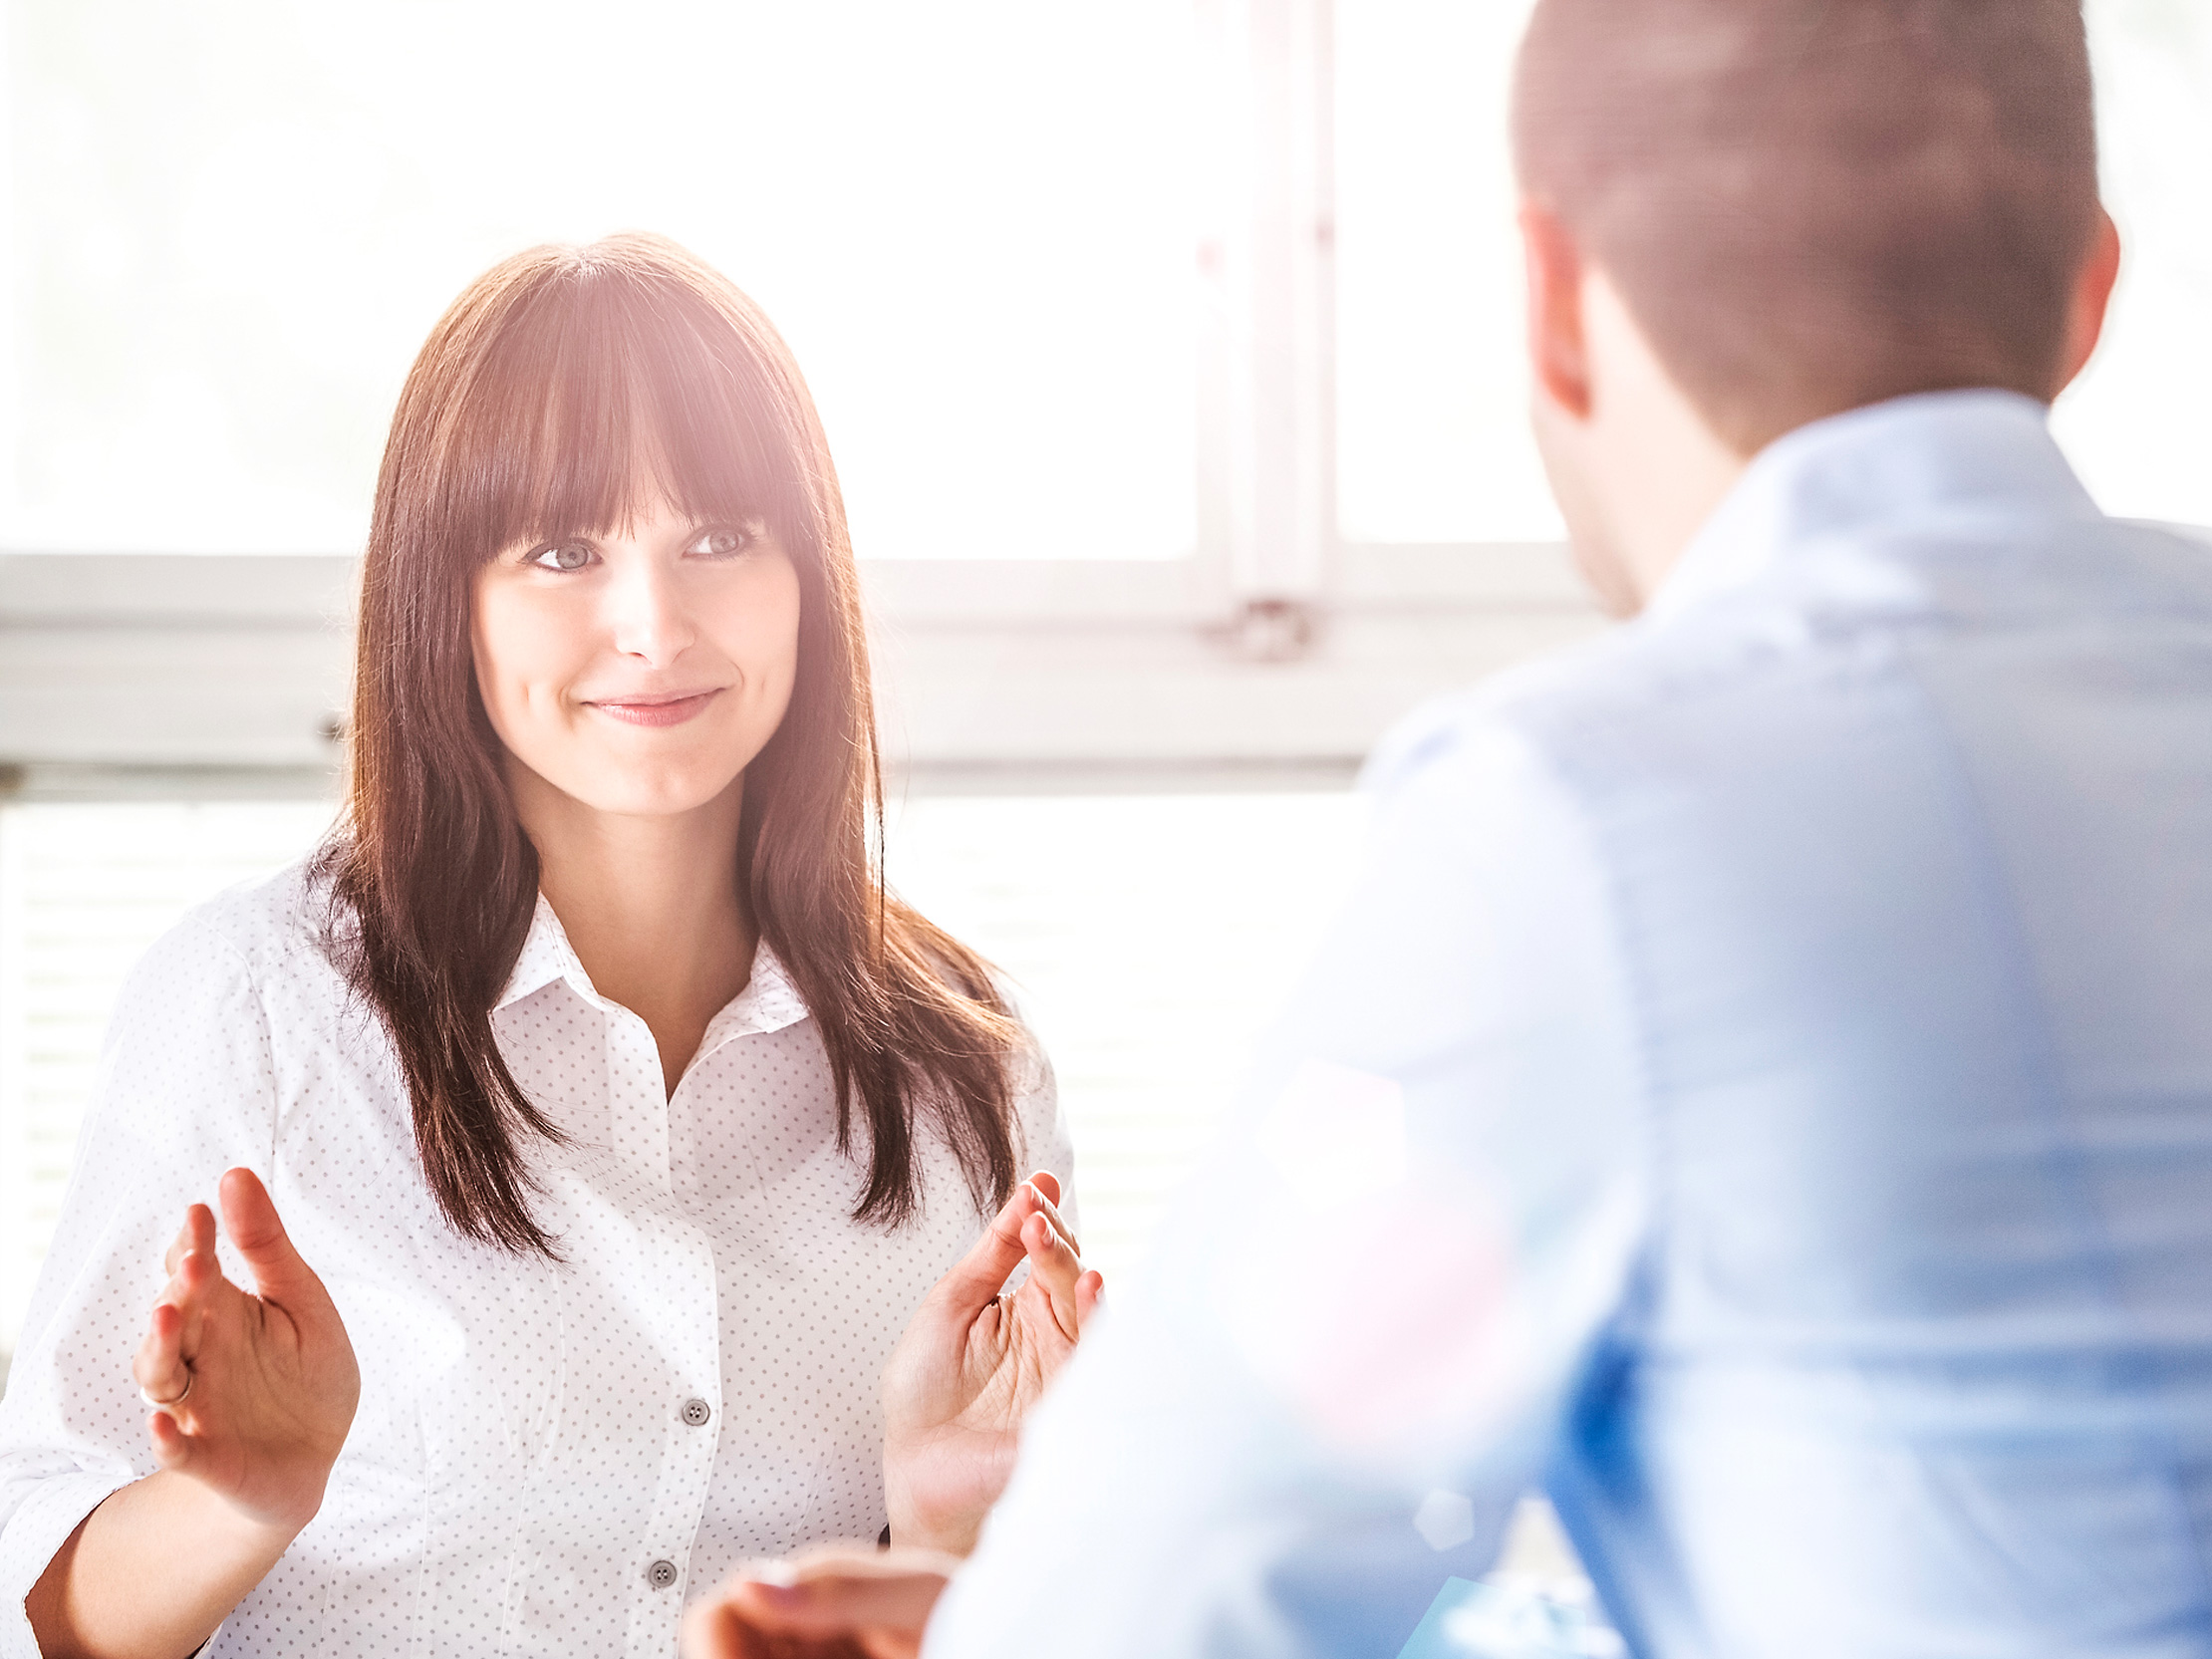 Få 5 gode råd til Assertiv kommunikation